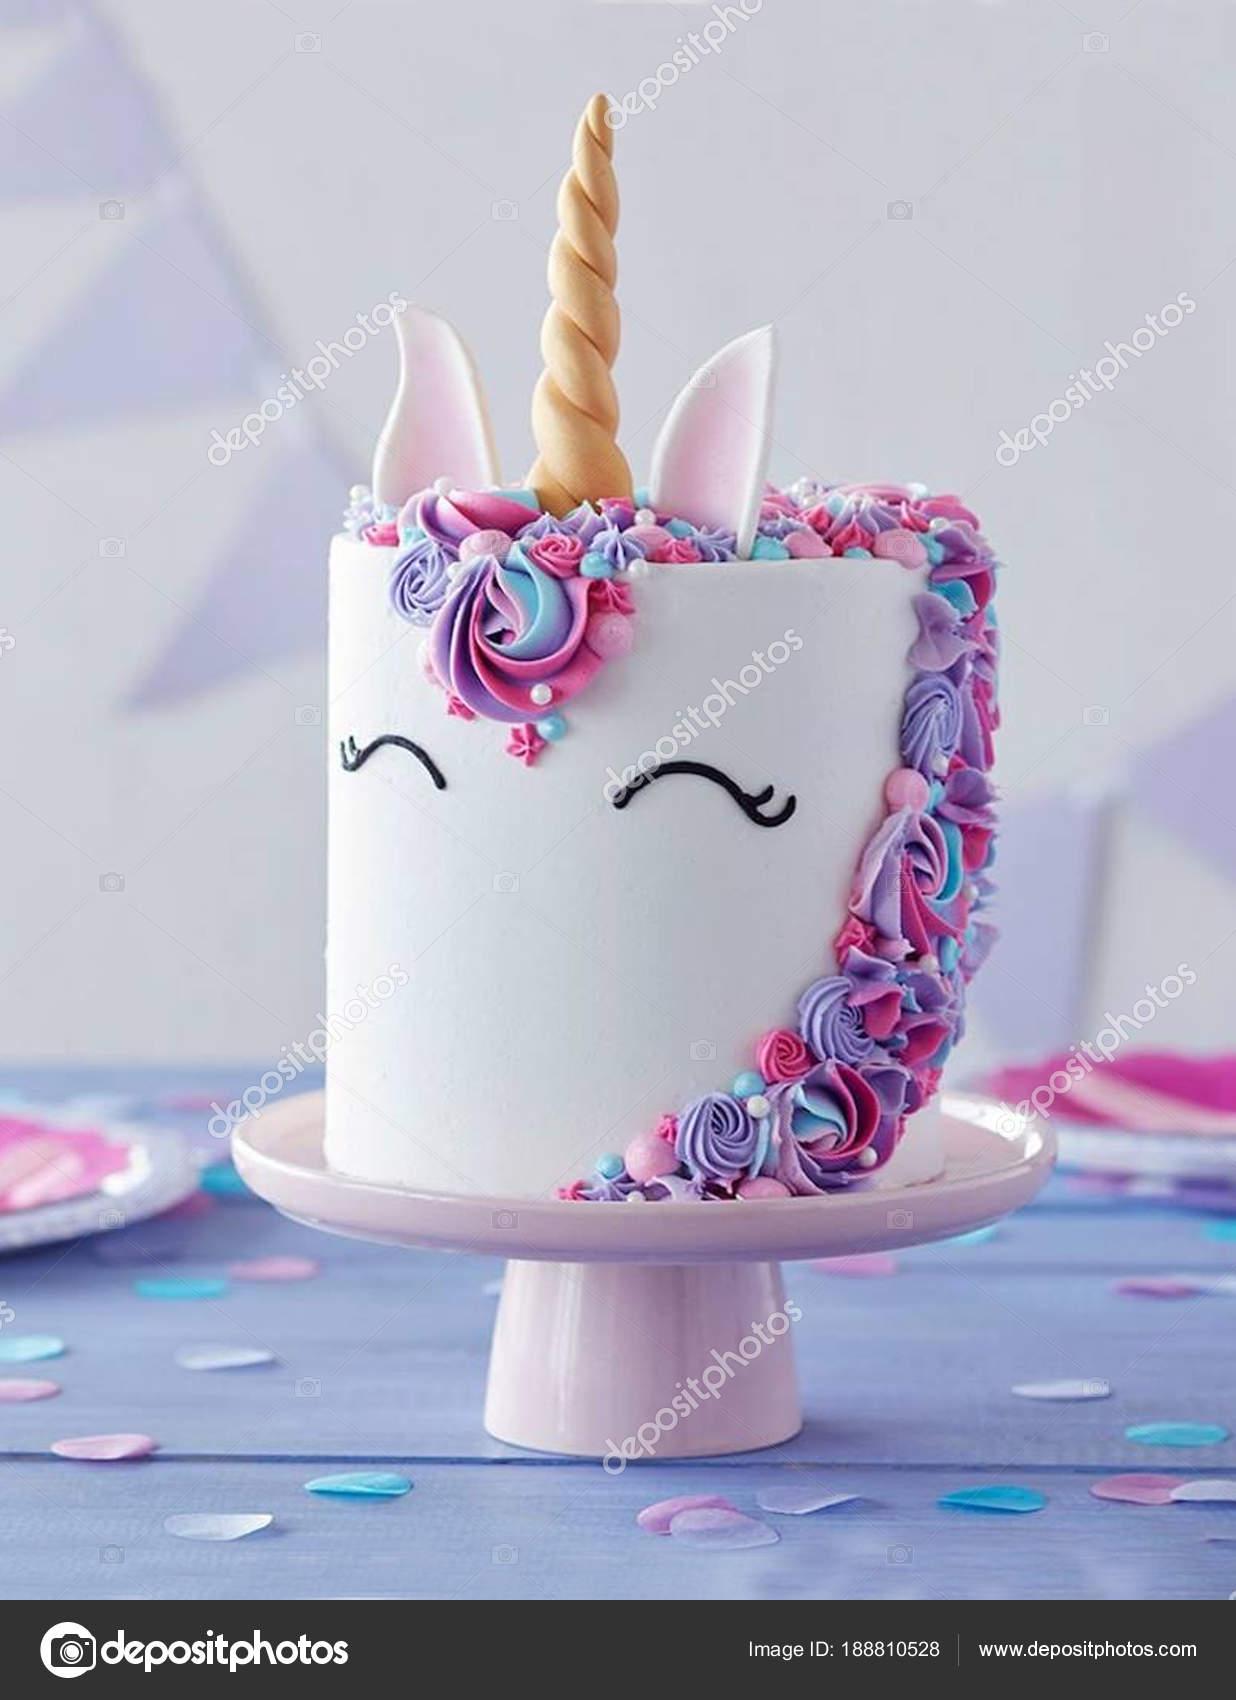 White cake form unicorn pink purple flowers stock photo white cake form unicorn pink purple flowers stock photo mightylinksfo